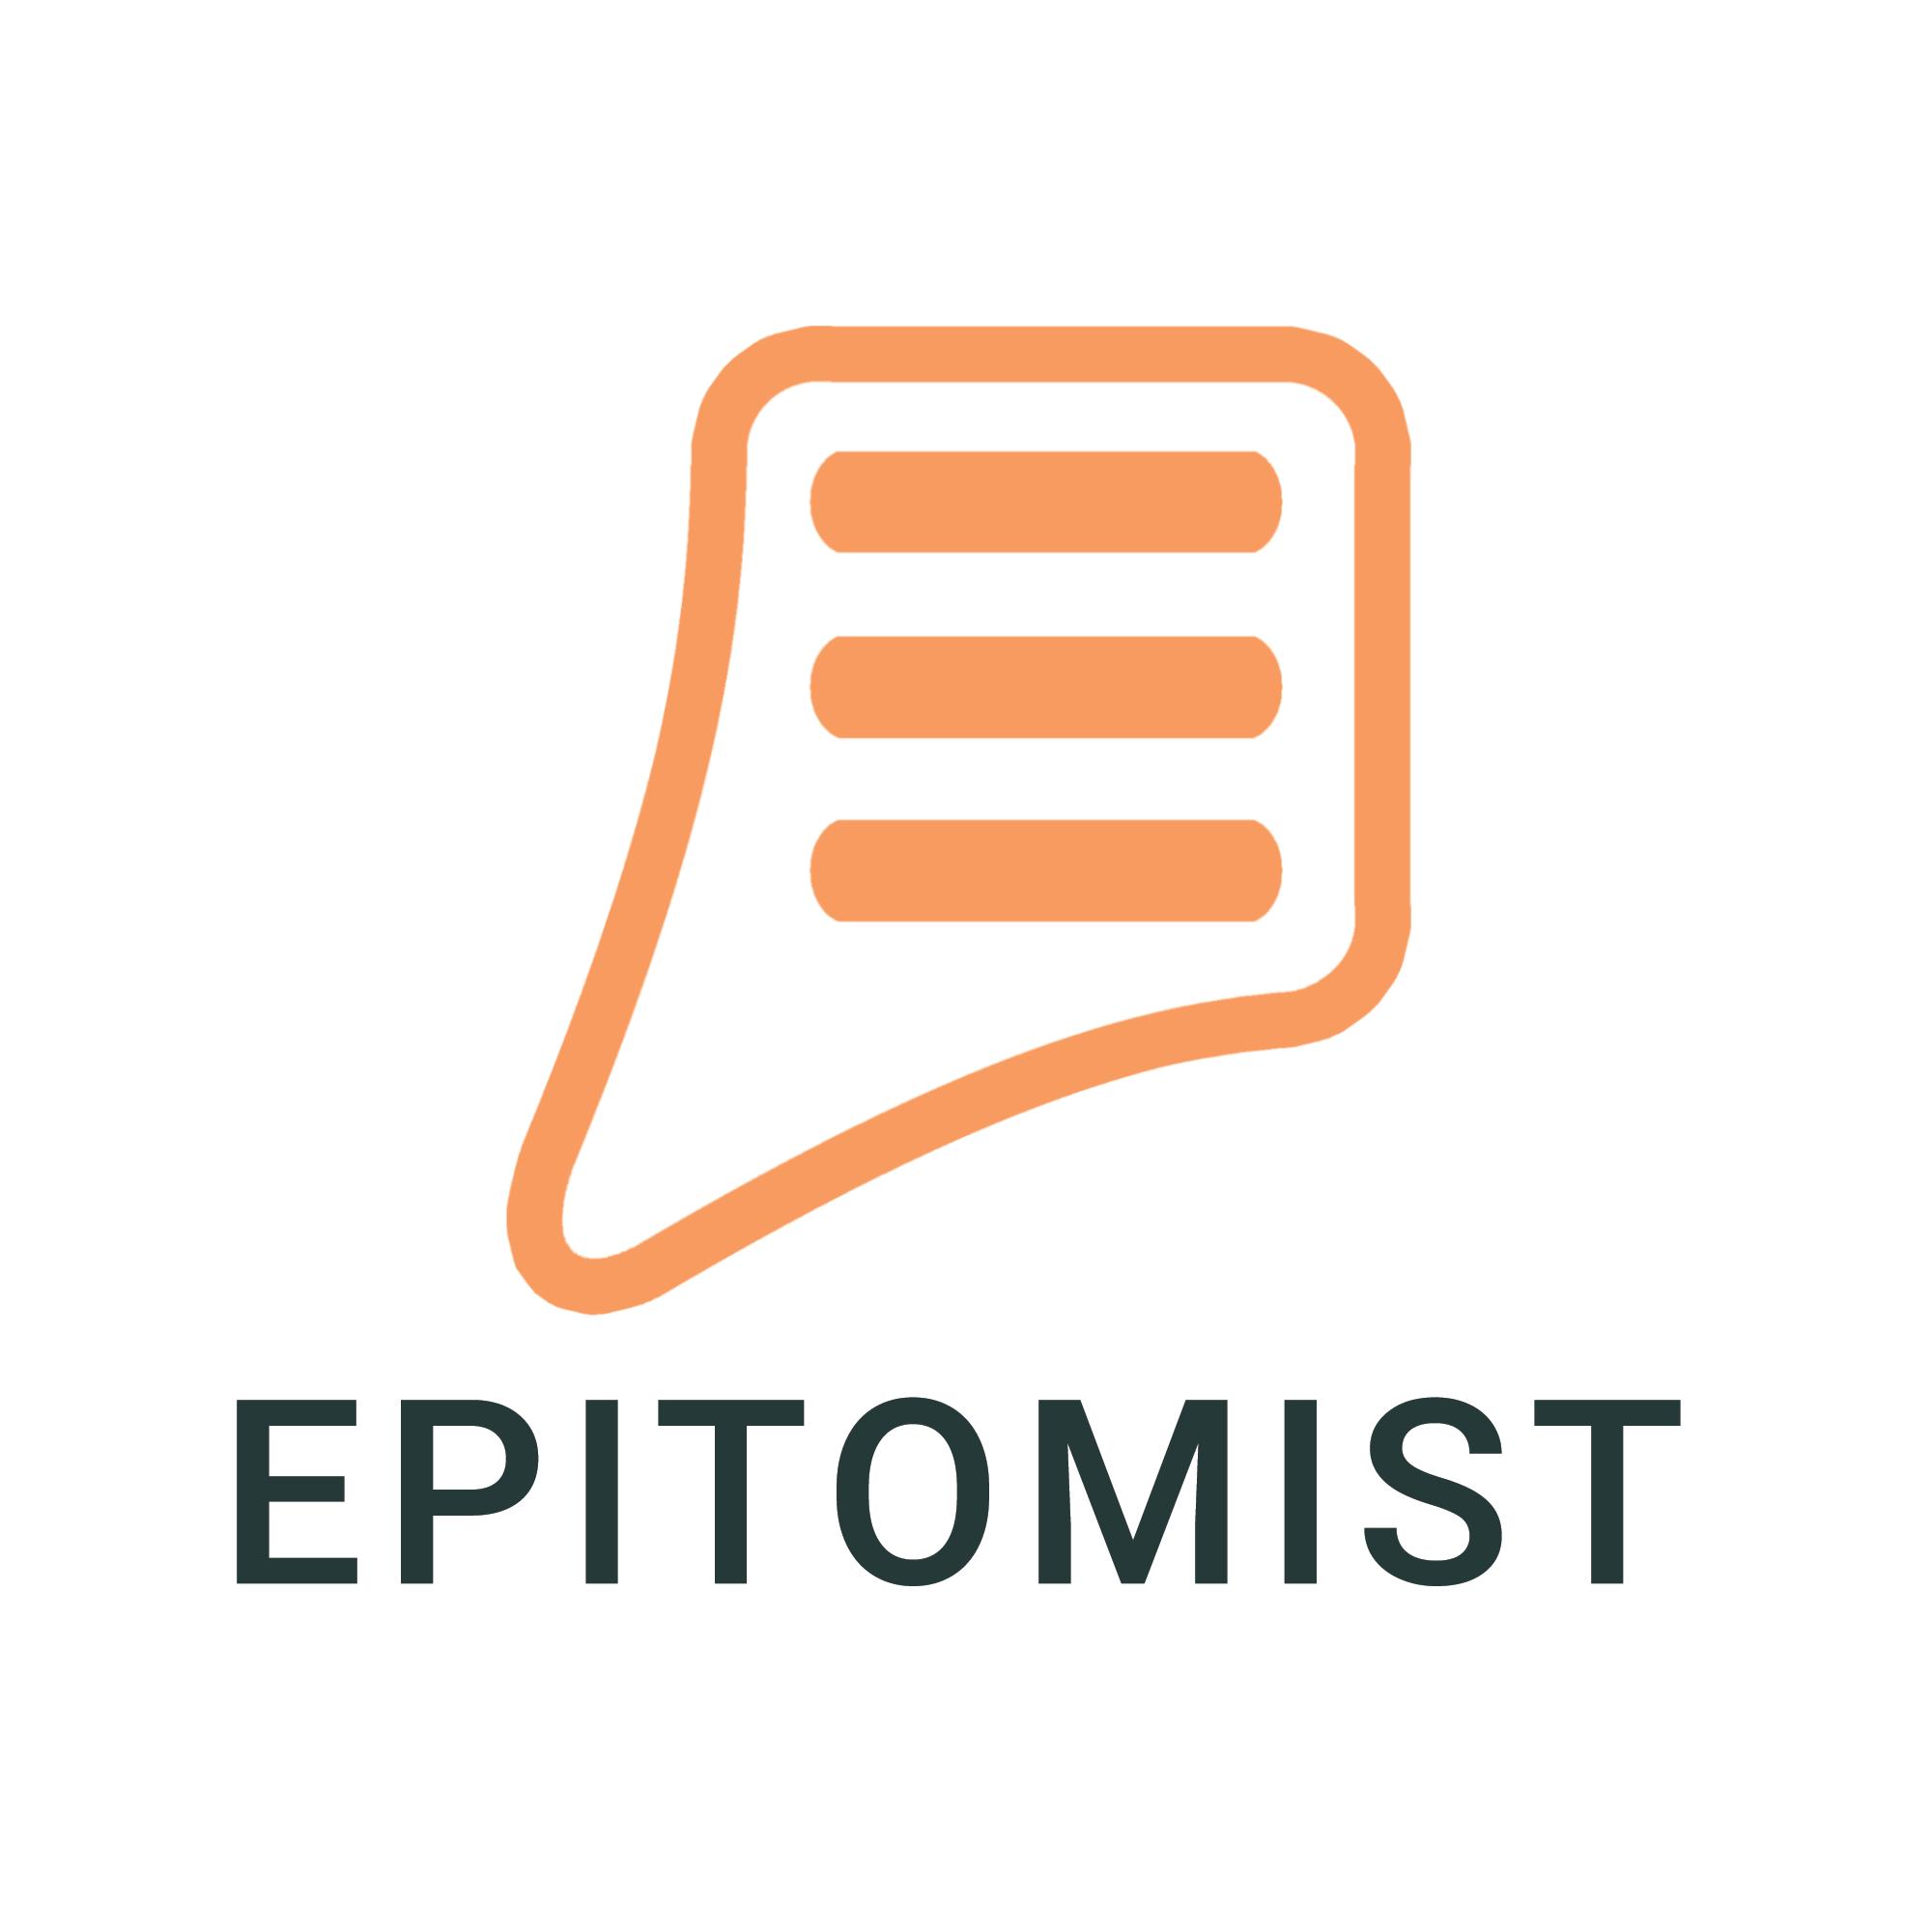 Epitomist - Asia-focused UX Agency